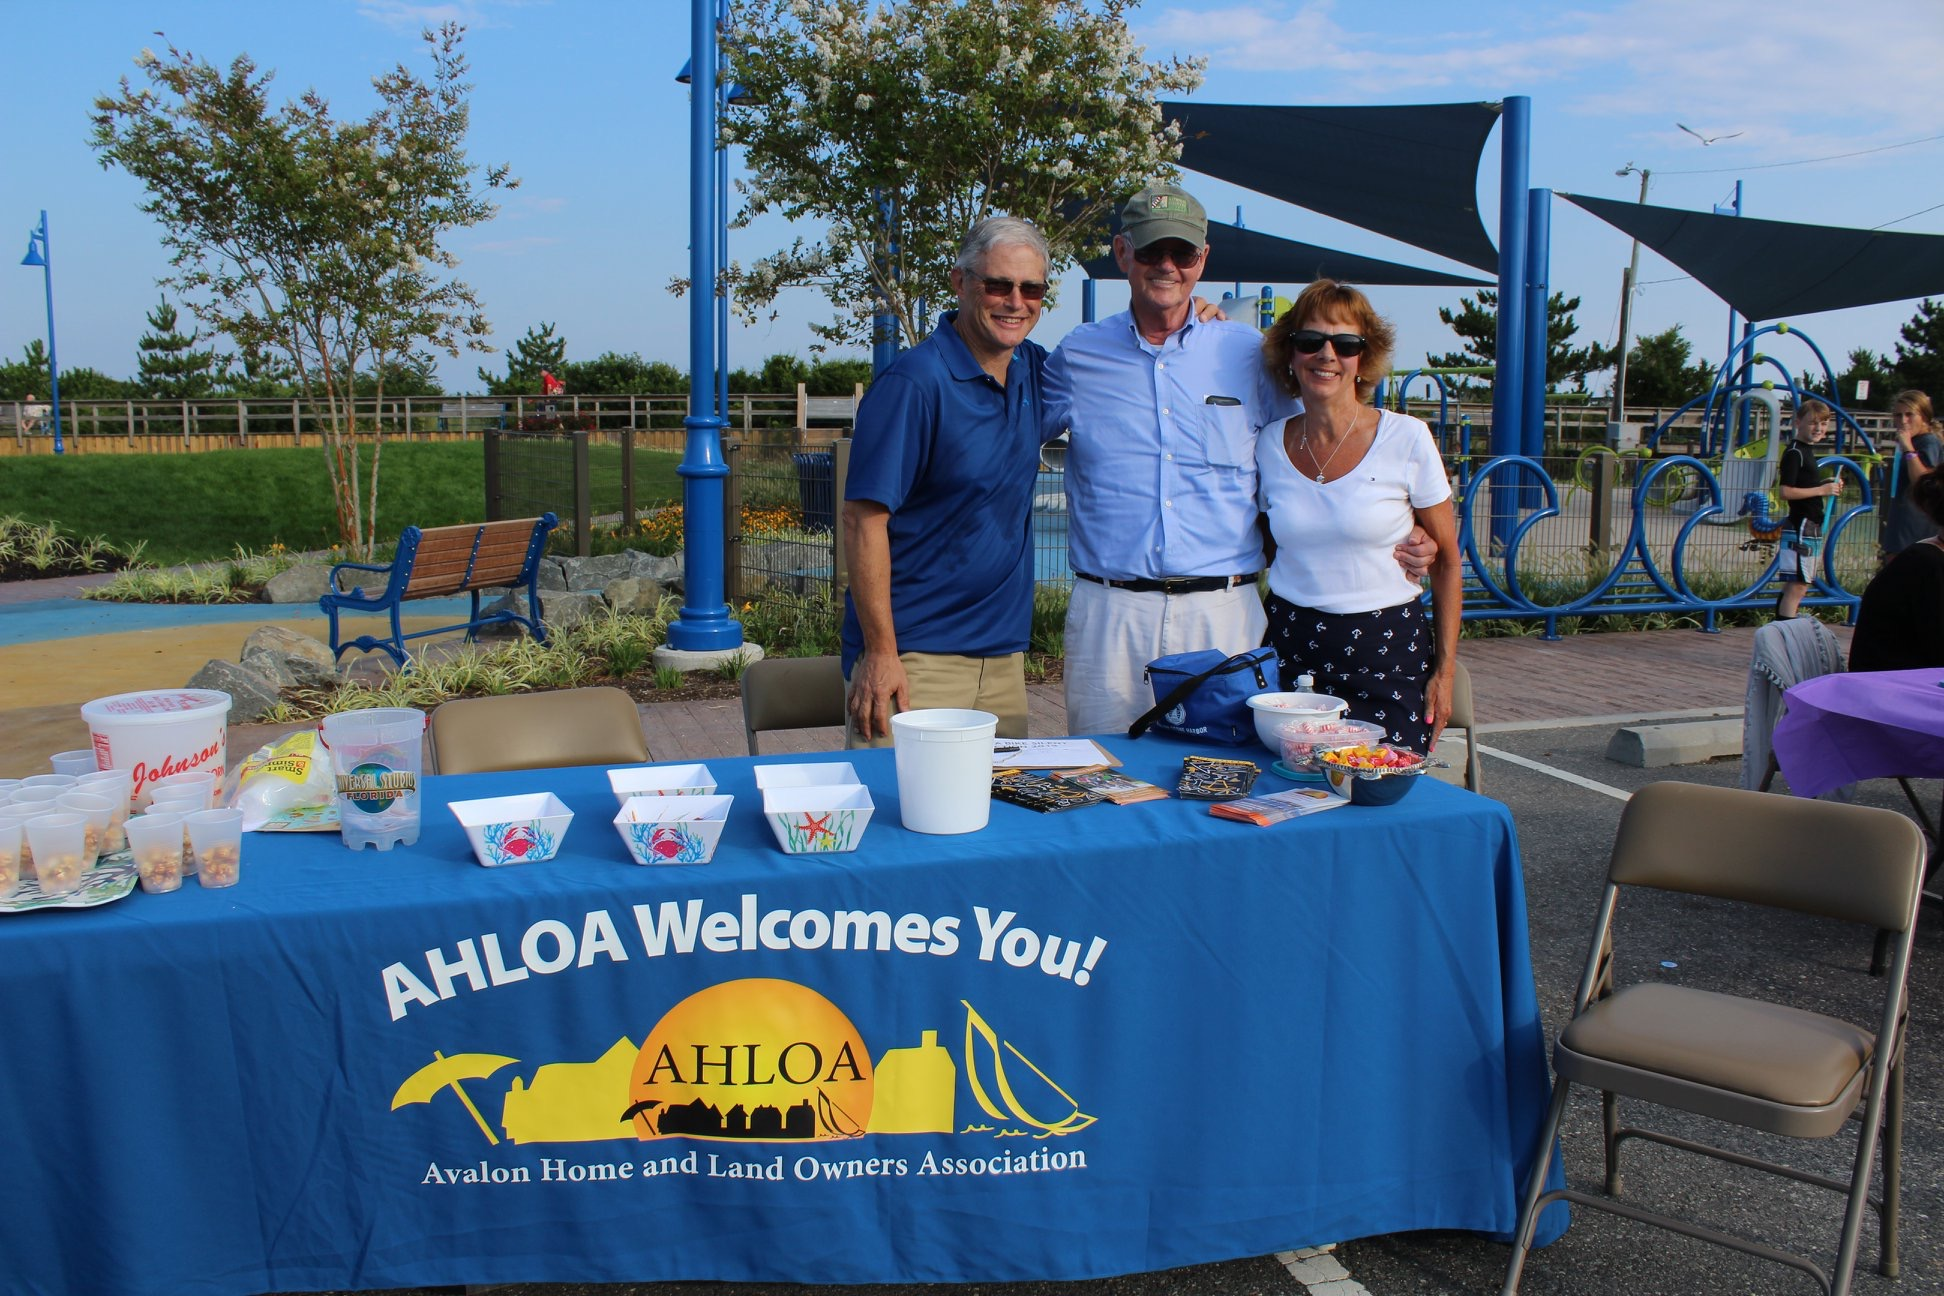 Left to right: Chuck O'Hara, Jack Keenan and Lynn Cruser